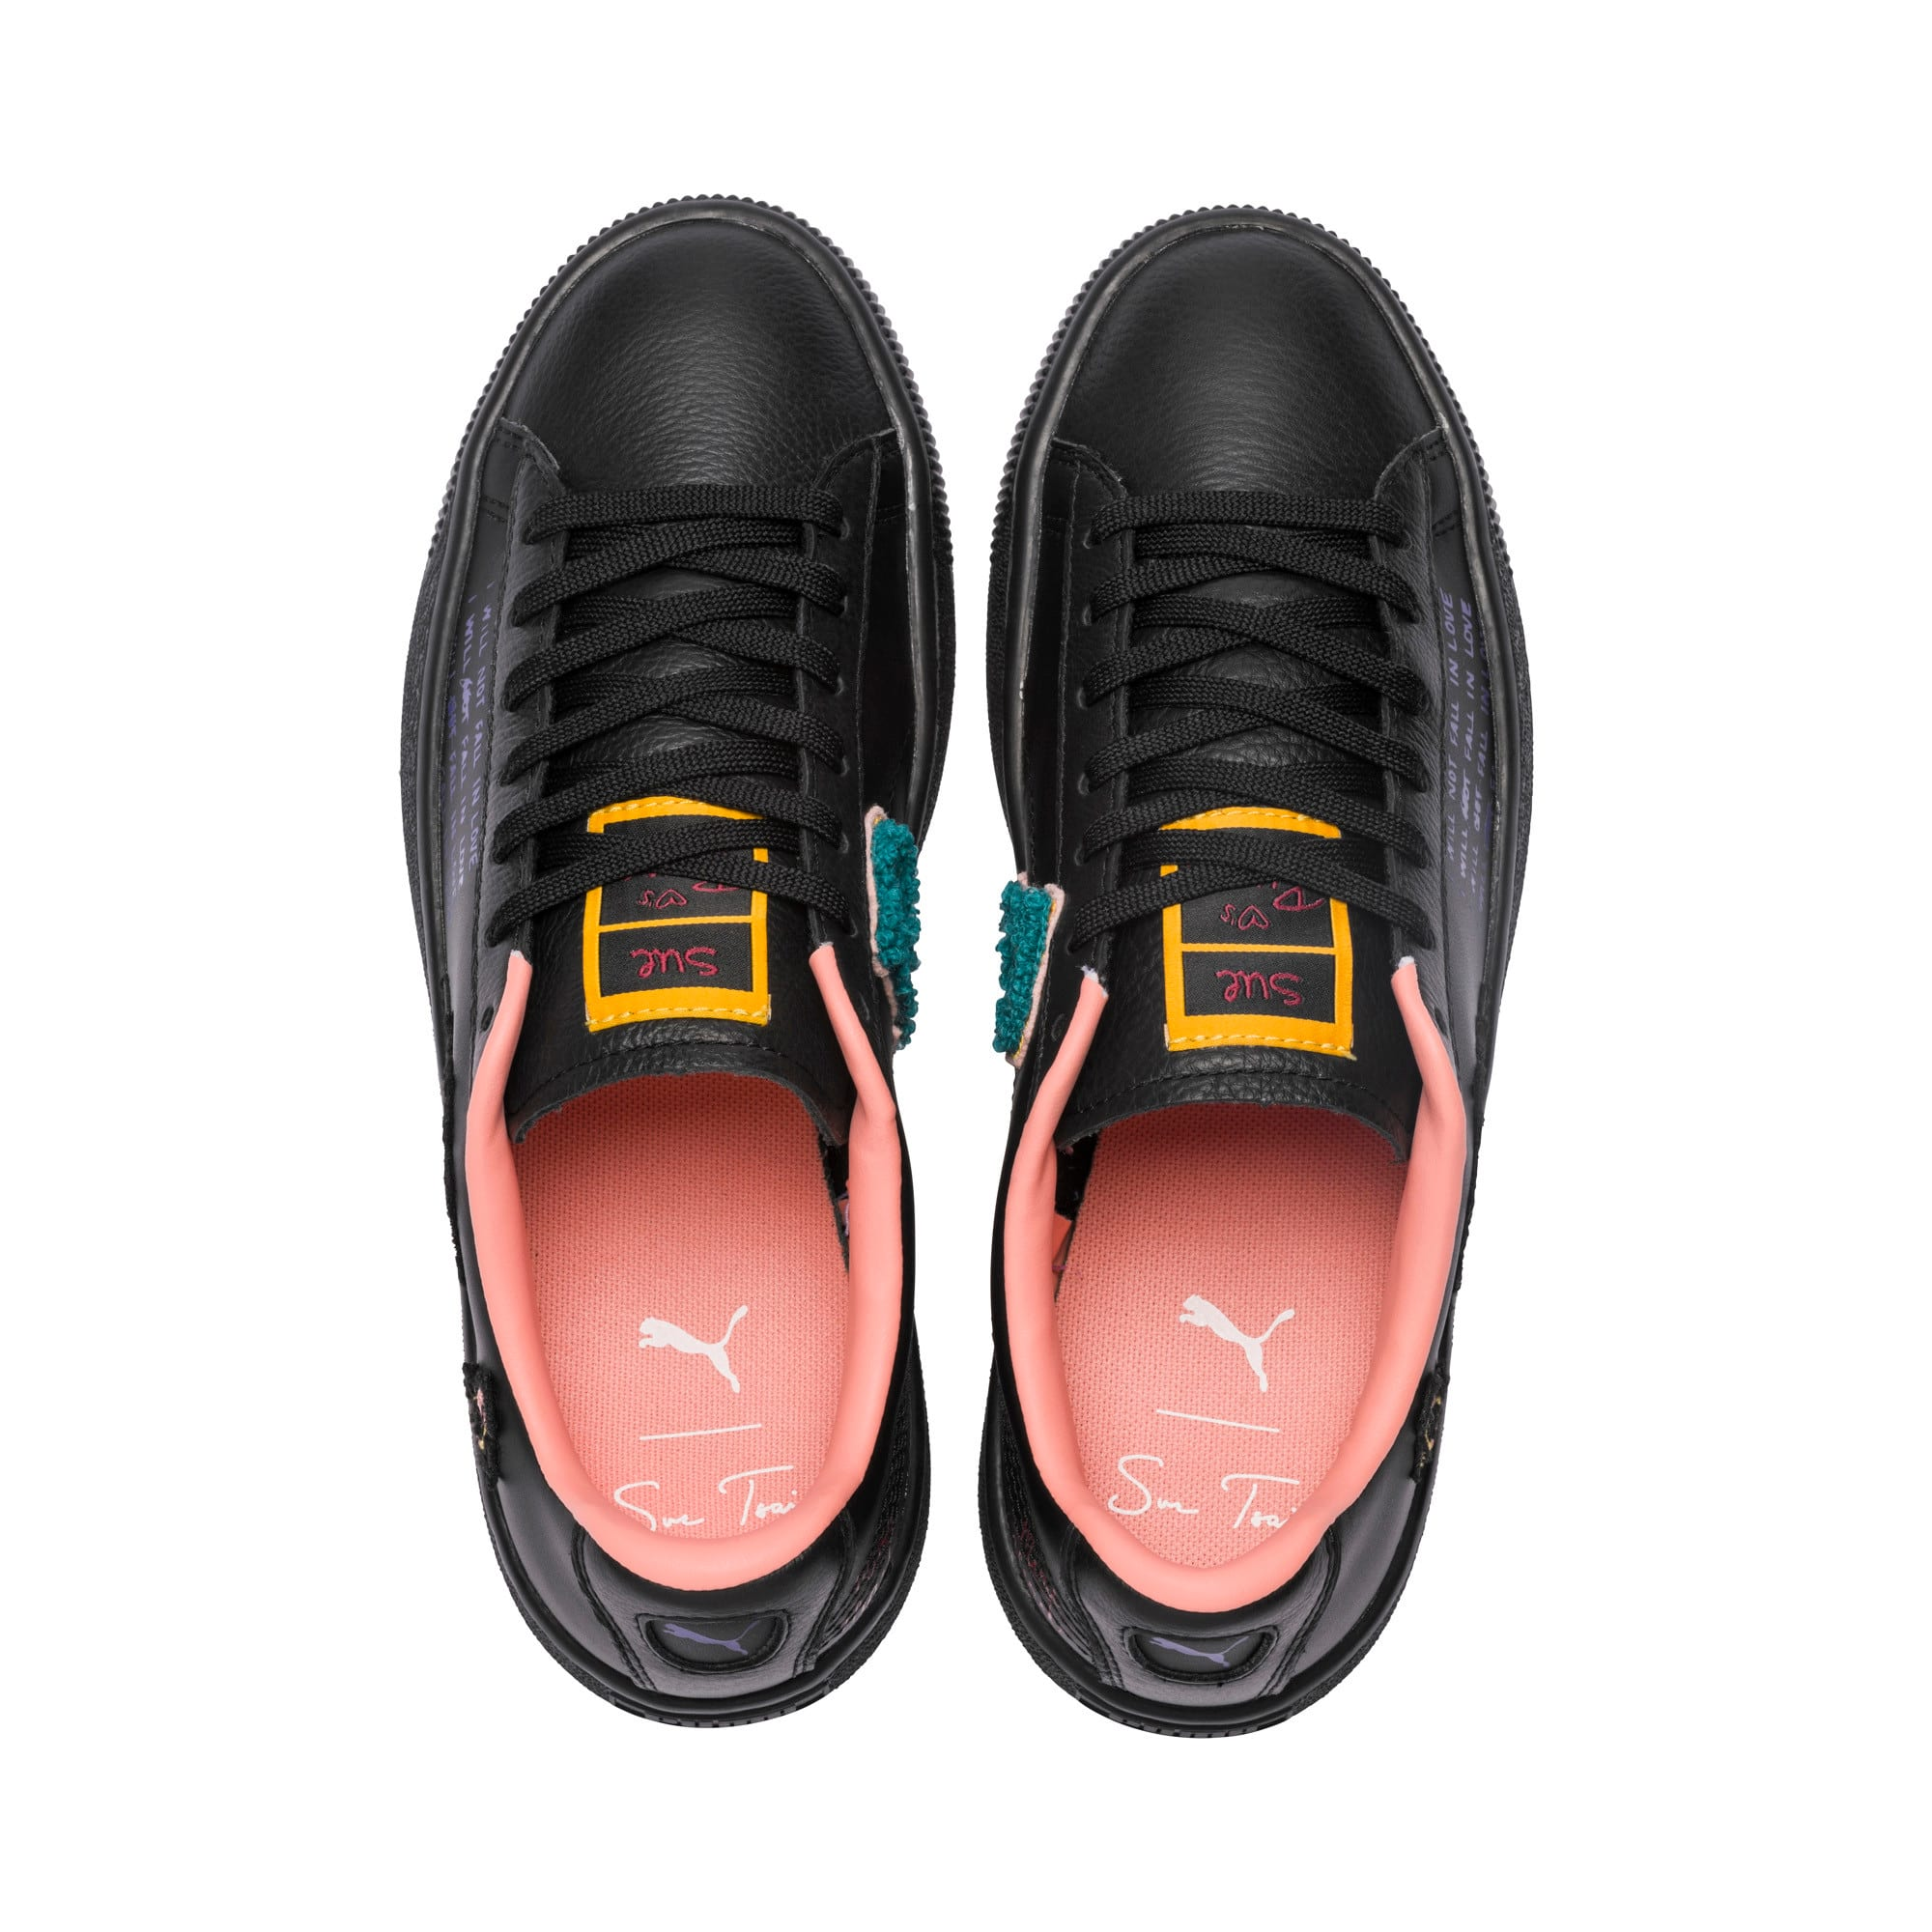 Thumbnail 6 of PUMA x SUE TSAI Basket Women's Sneakers, Puma Black, medium